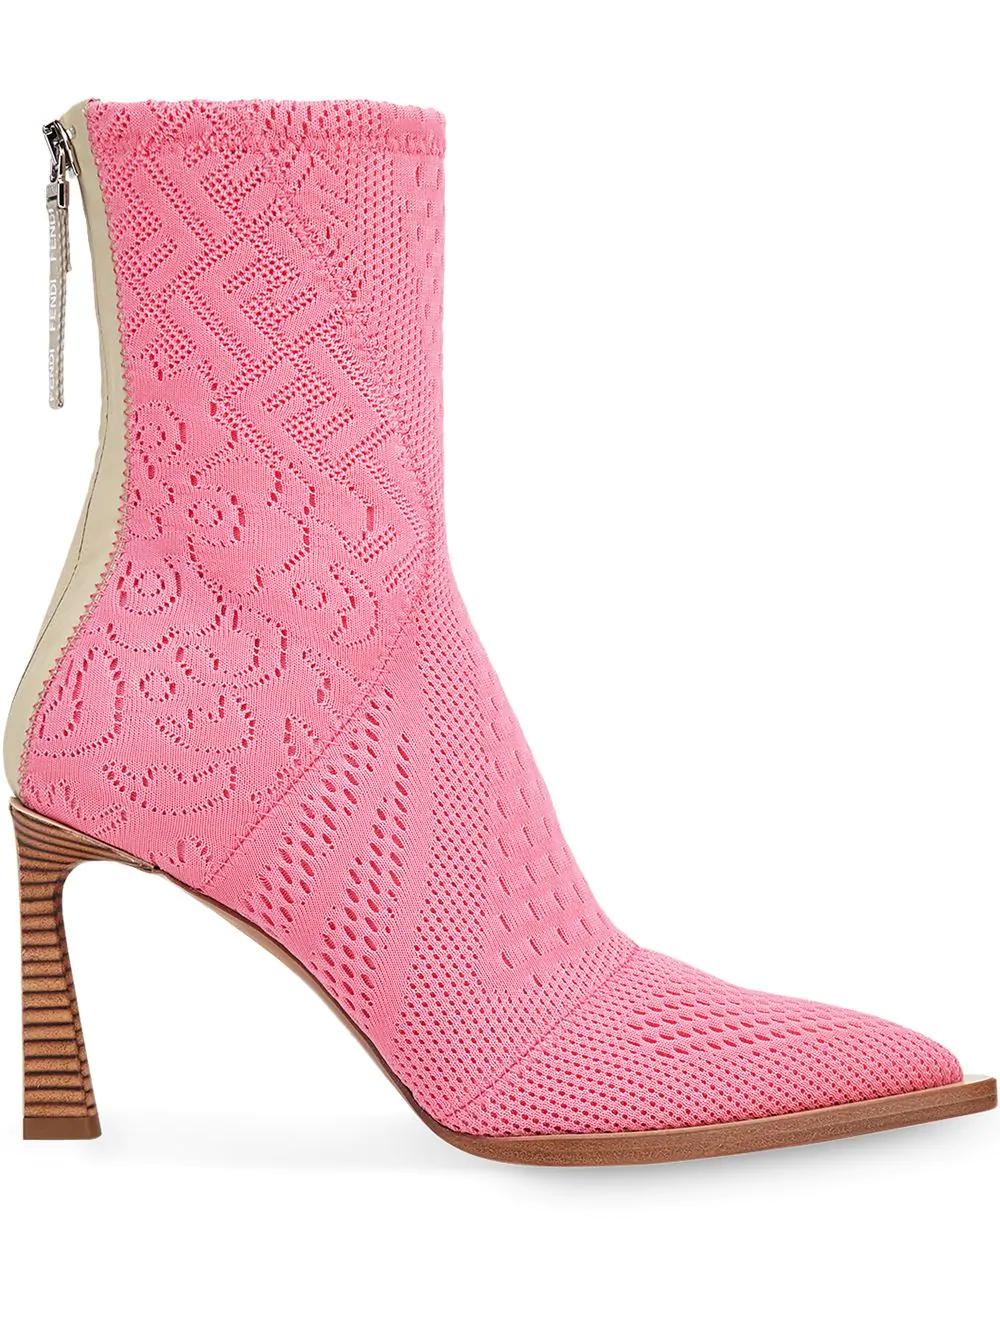 Fendi FFrame Jacquard Ankle Boots